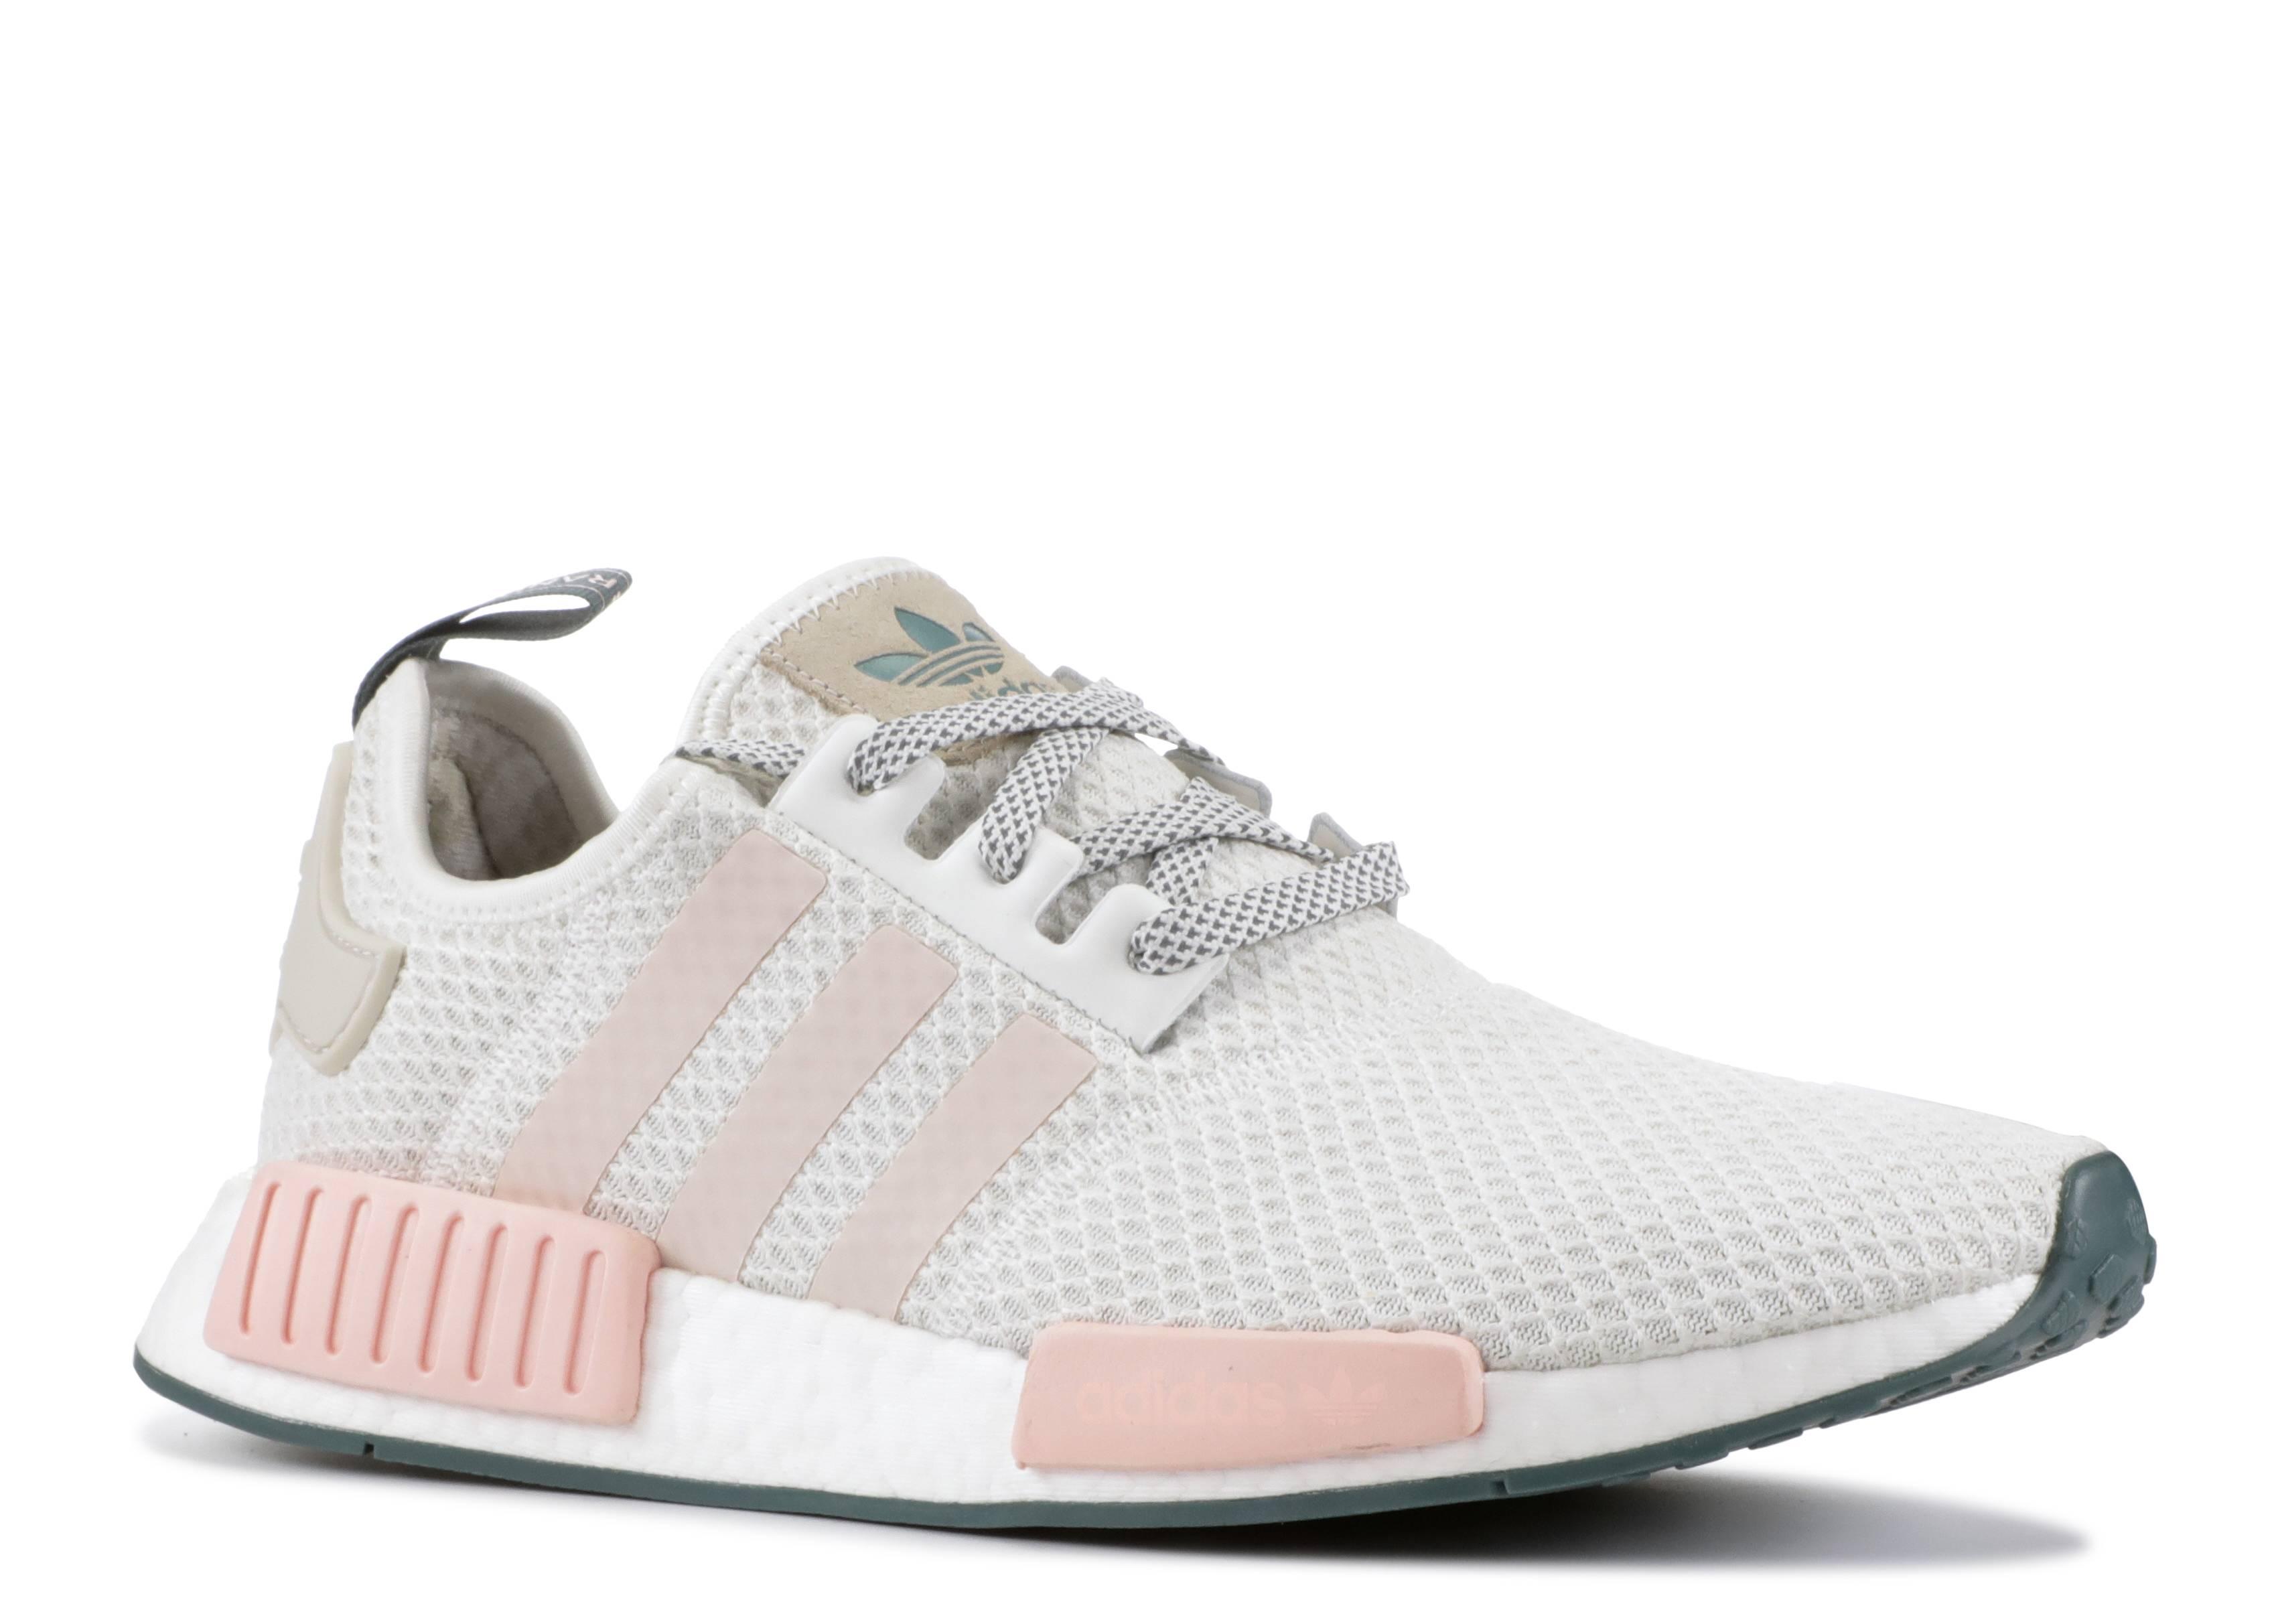 e445dabbc608c NMD R1 W - Adidas - d97232 - cloud white talc icey pink